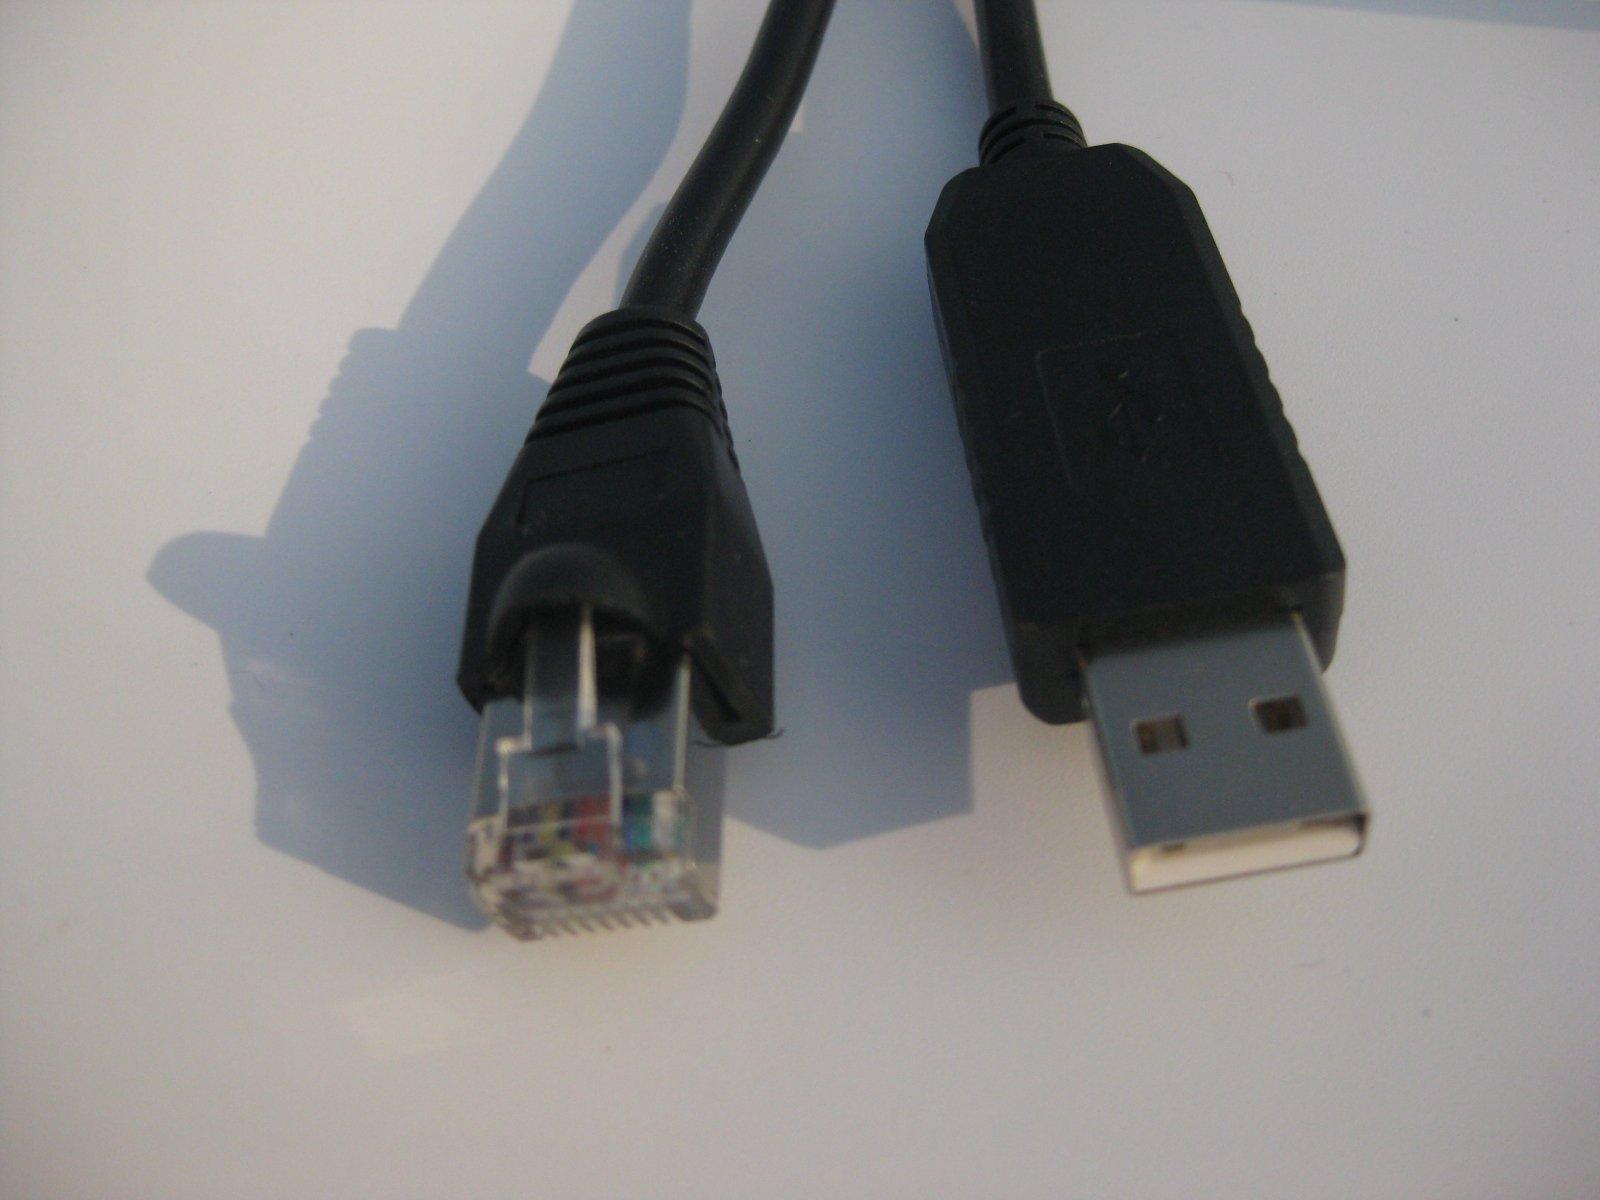 Green-utech USB Programming Cable for Motorola Gp328 Gp338 Ht1250 Ht750 Gp329 Gp339 Gp320 Xts960 Ptx760 Gp380 Gp340 Gp1280 Gp318 Gp238 Gp308 Gp208 Mtp700 Mtp750 Ht1550 Pro5150 Pro5750 Pro5450